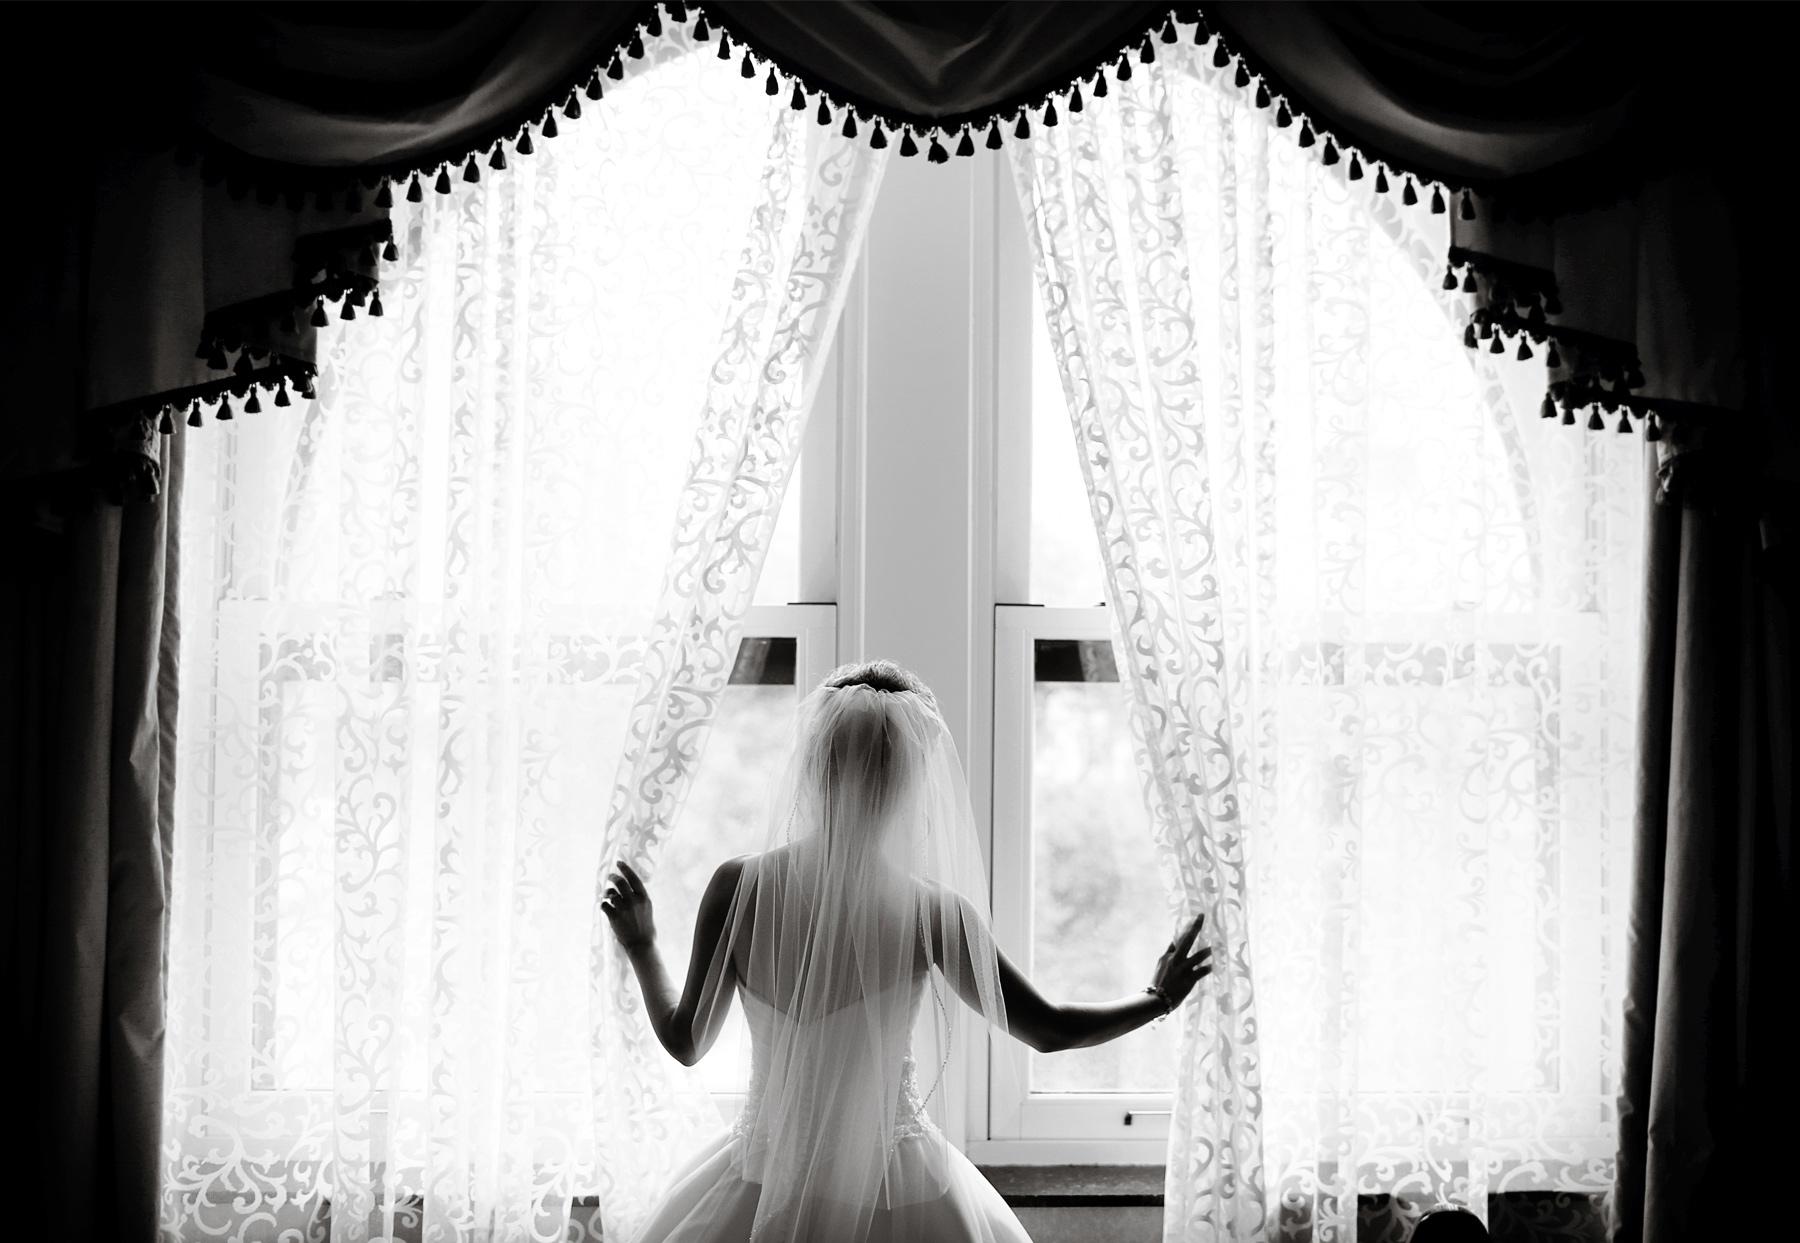 01-Minneapolis-Minnesota-Wedding-Photography-by-Vick-Photography-The-Depot-Bride-Dress-Courtney-&-John.jpg